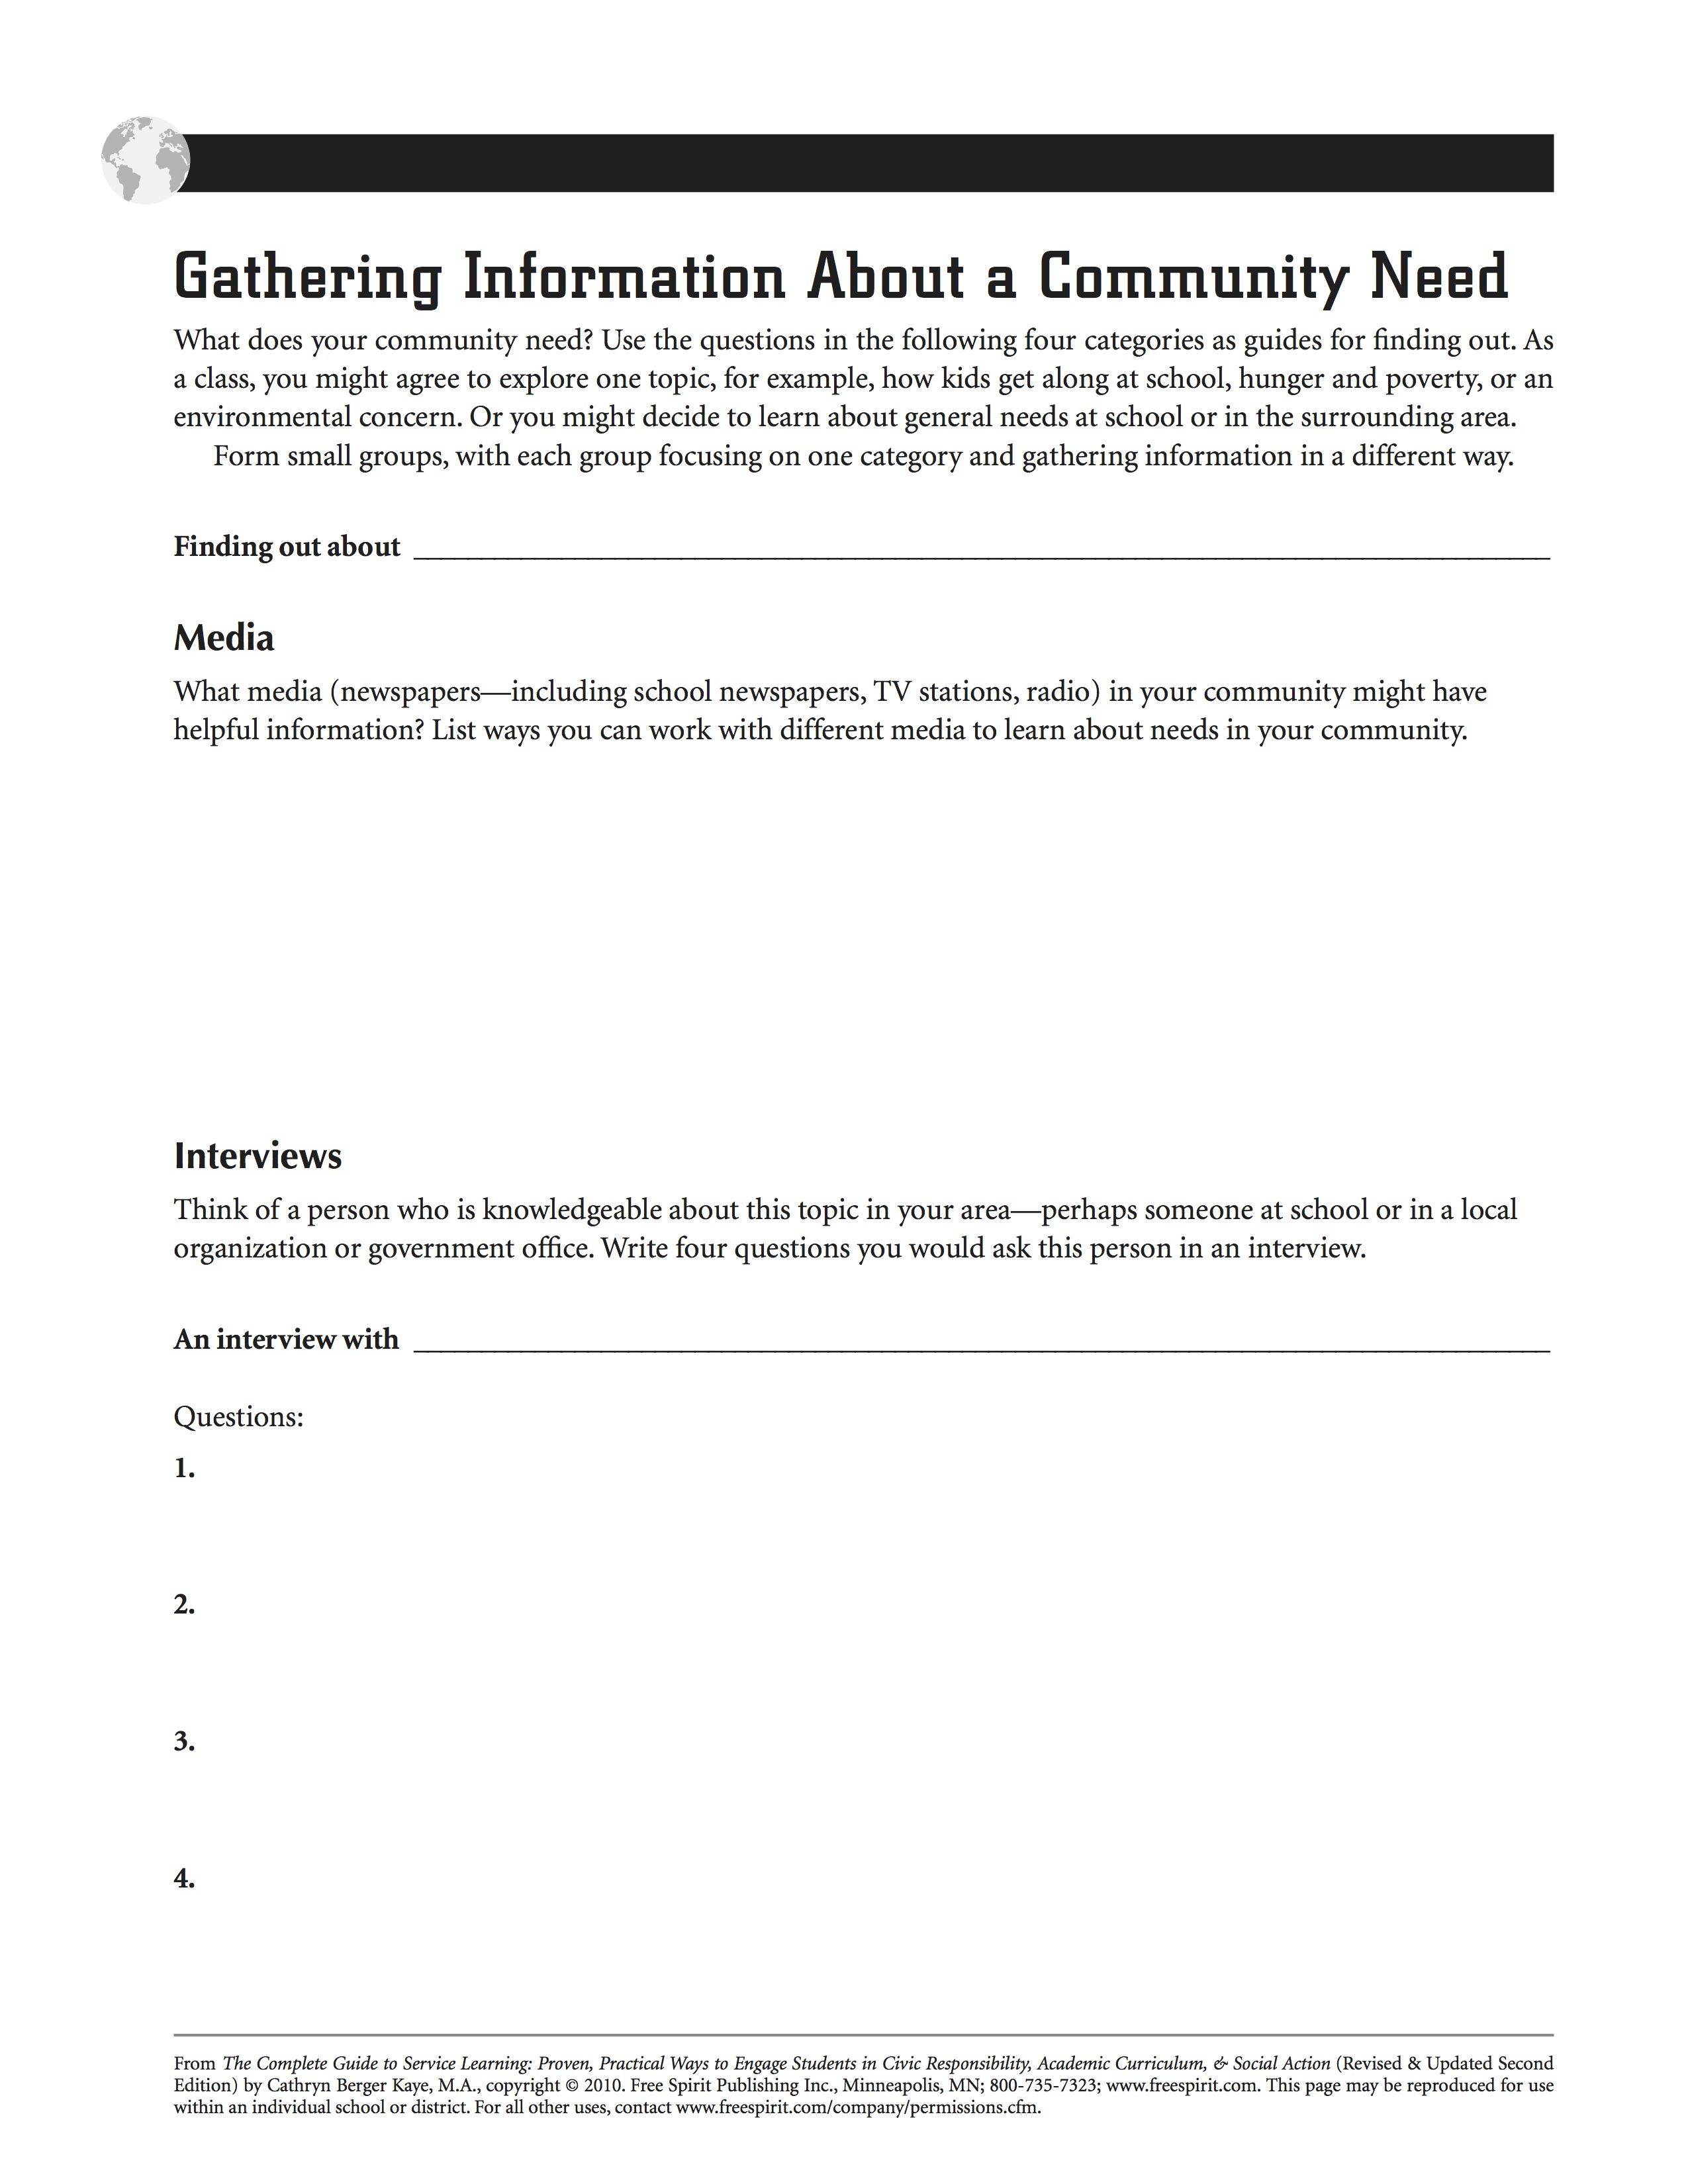 Free Printable Service Learning Worksheet Gathering